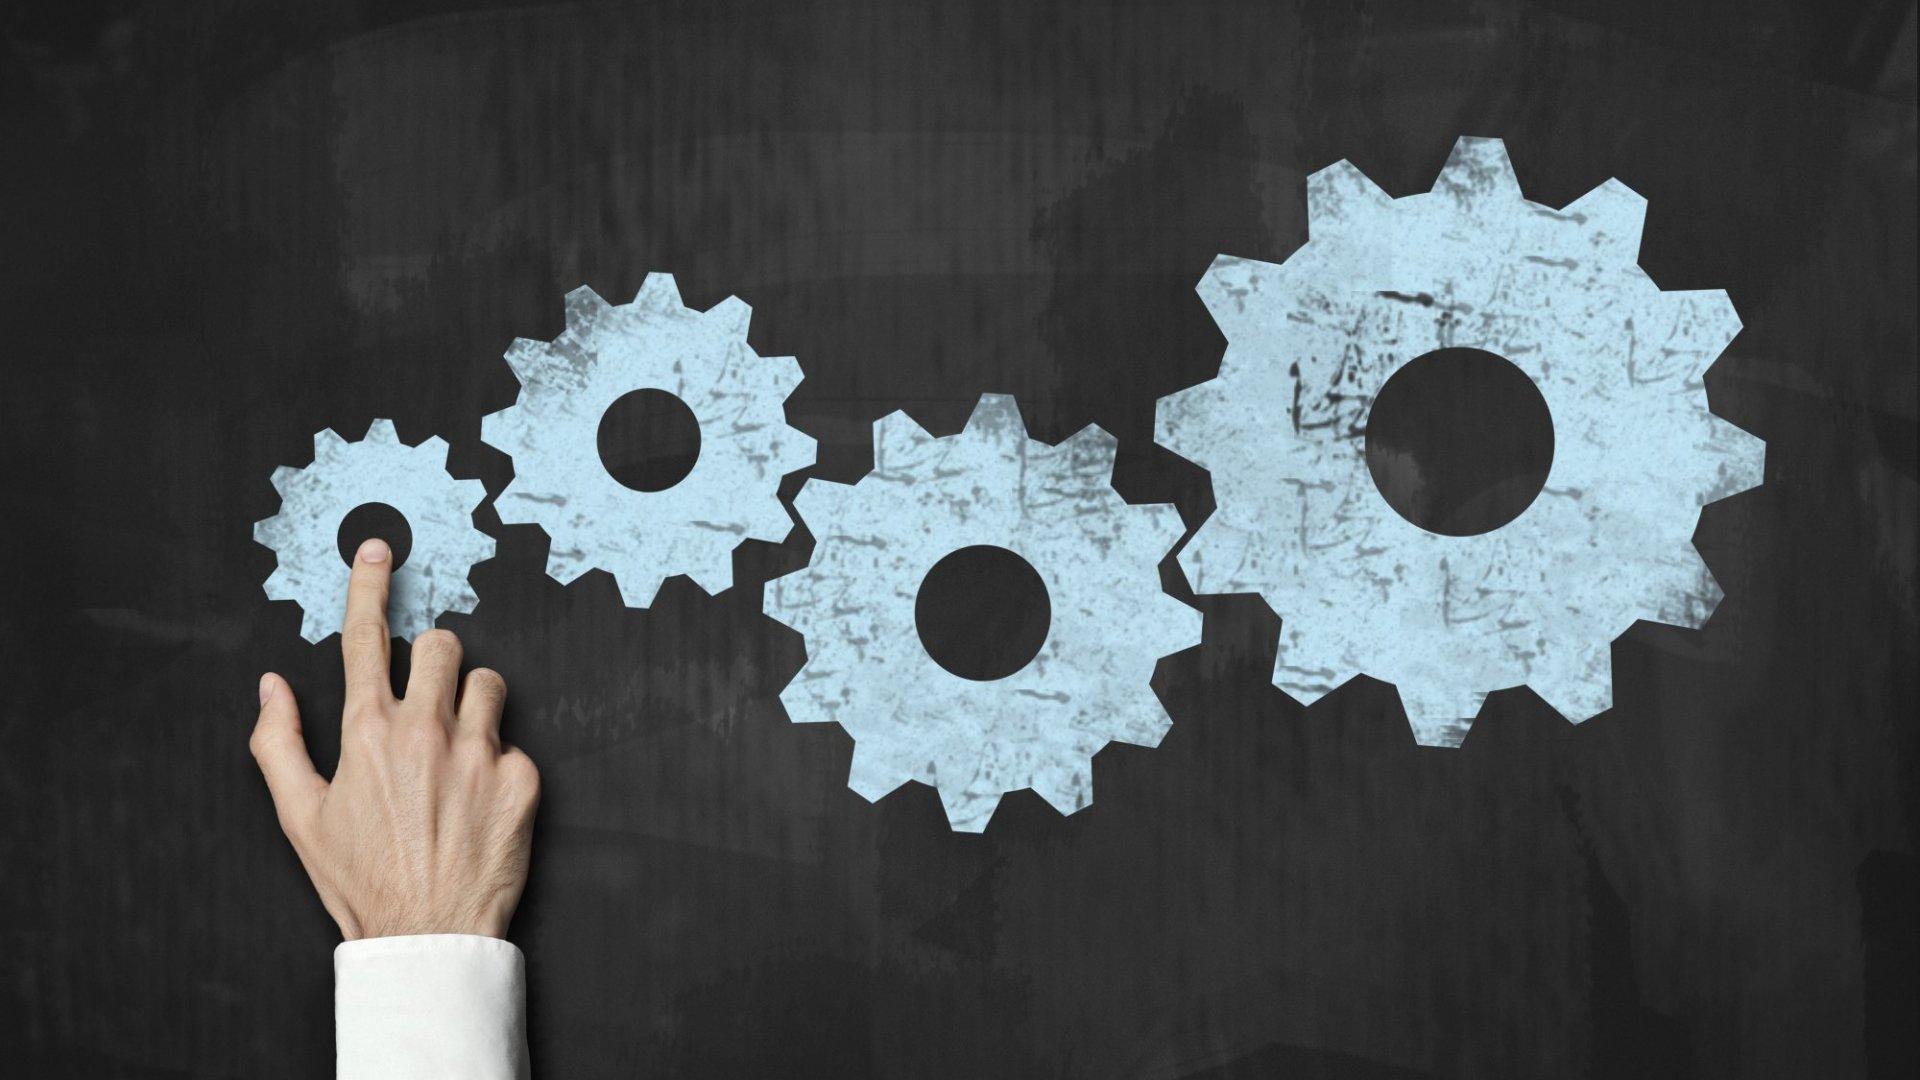 Better Together: Tactile/Hard Copy and Digital Marketing